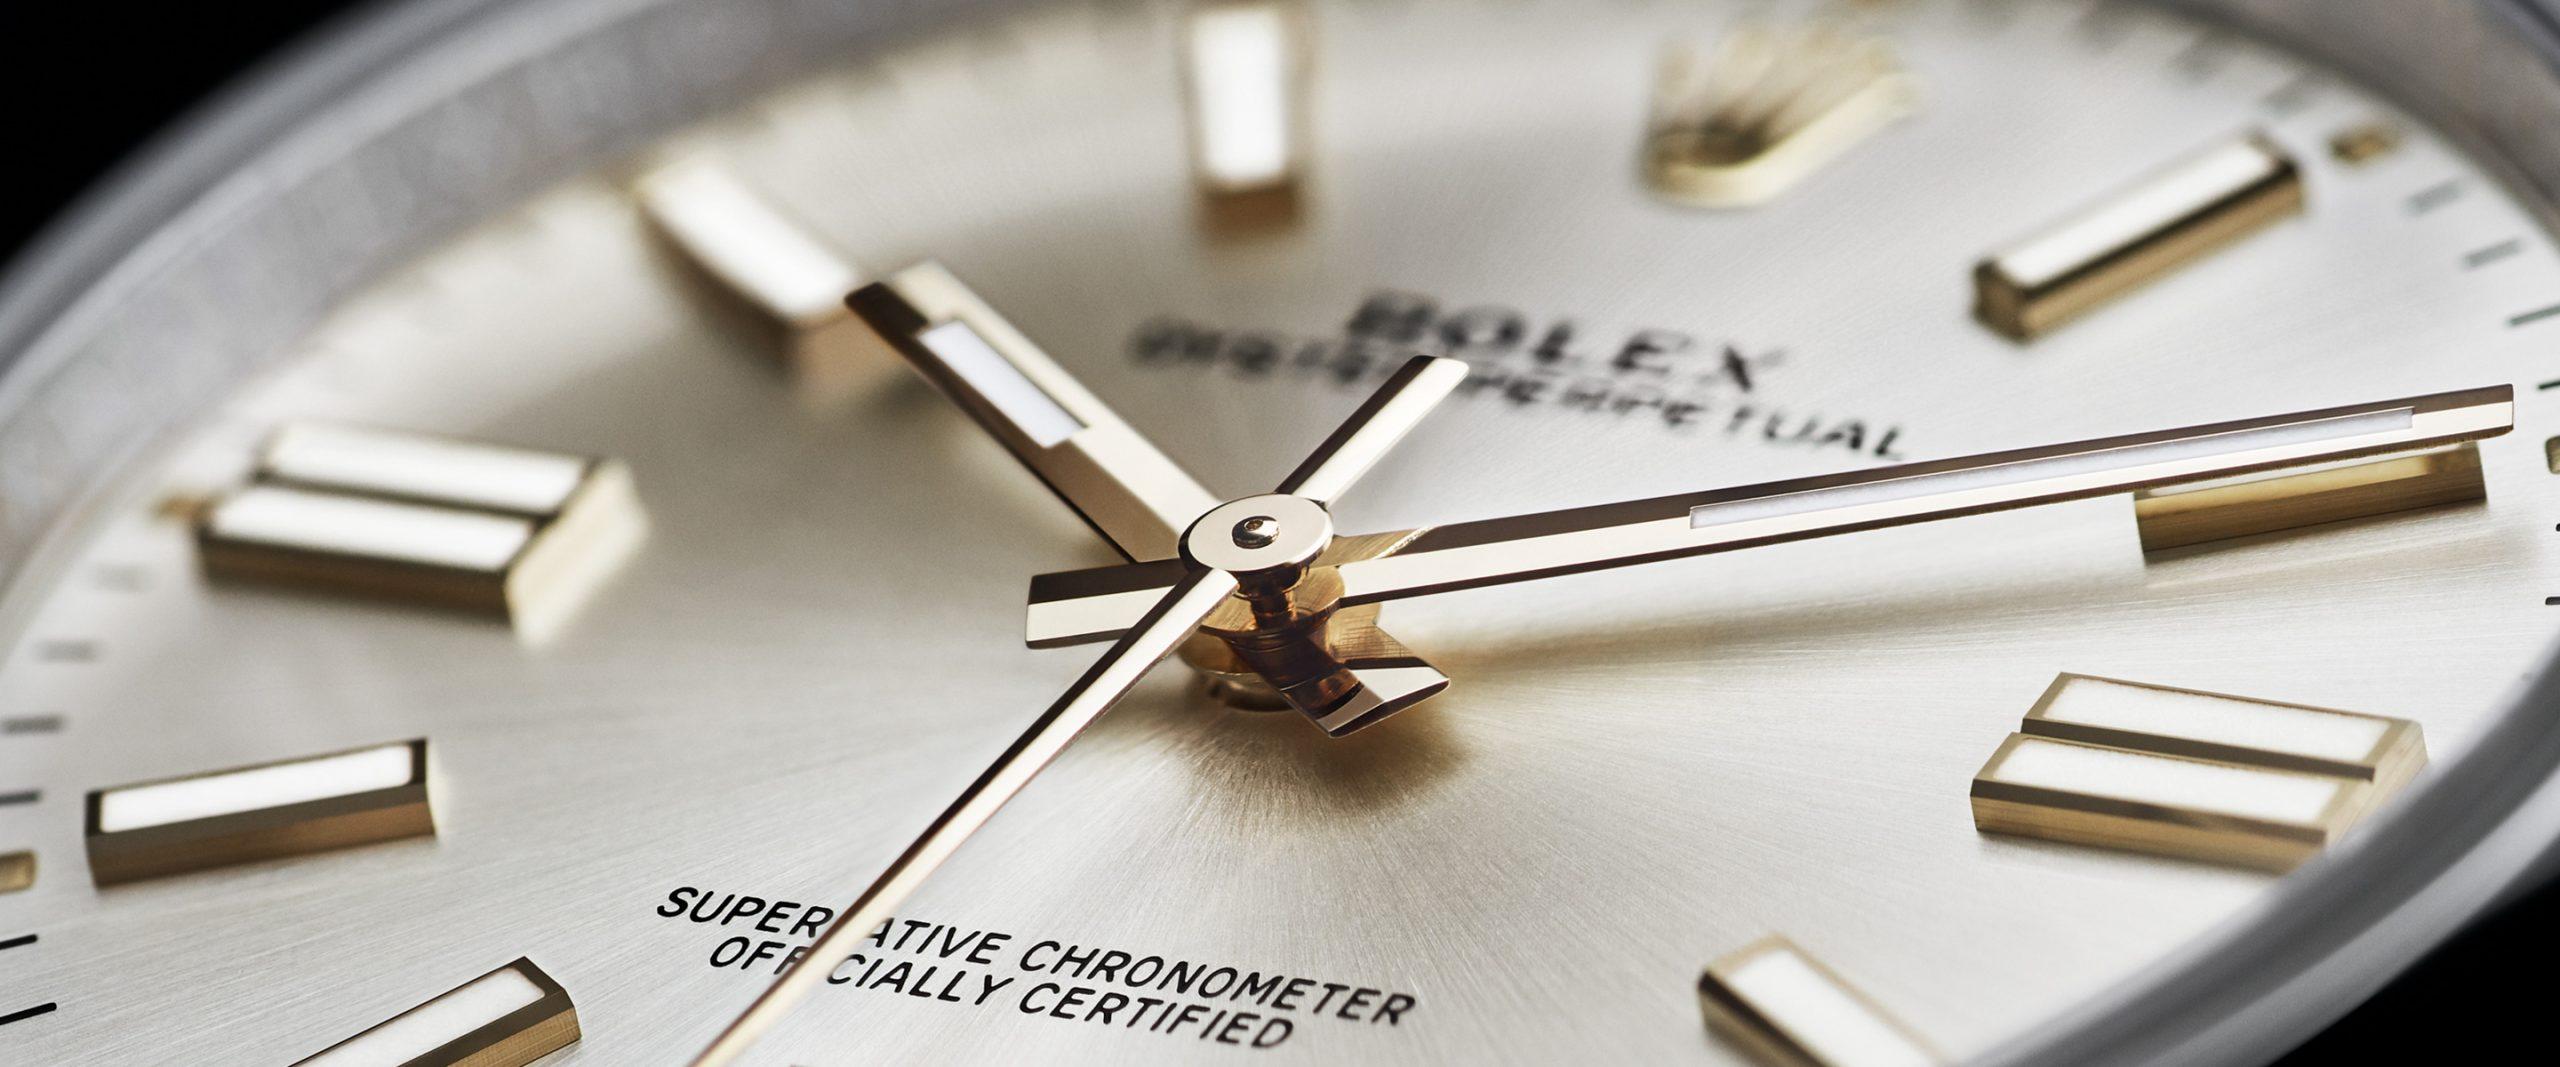 Rolex Watches Grand Rapids Mi